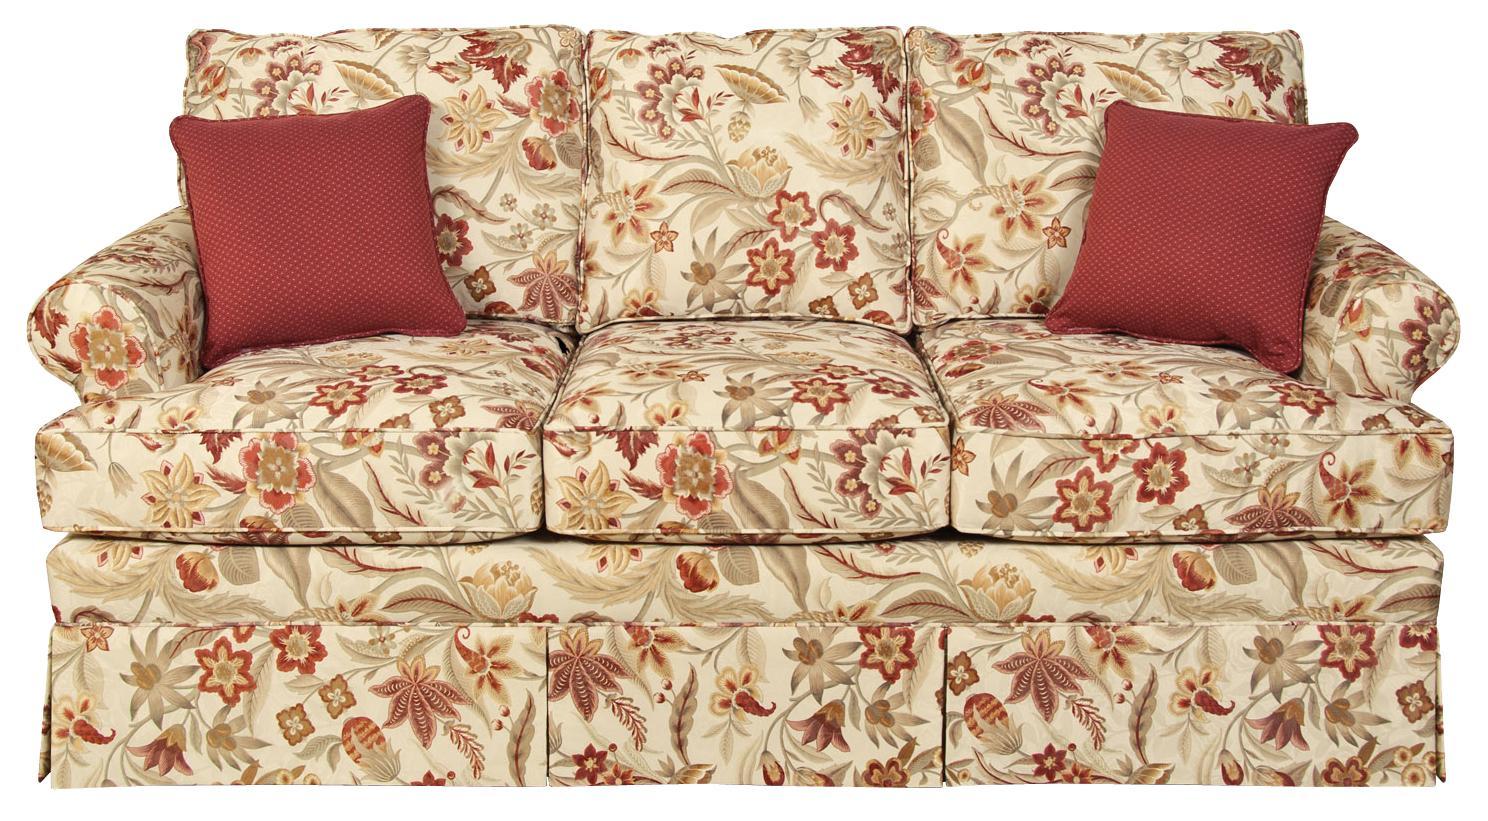 England William 5335 Traditional Skirted Sofa Dunk